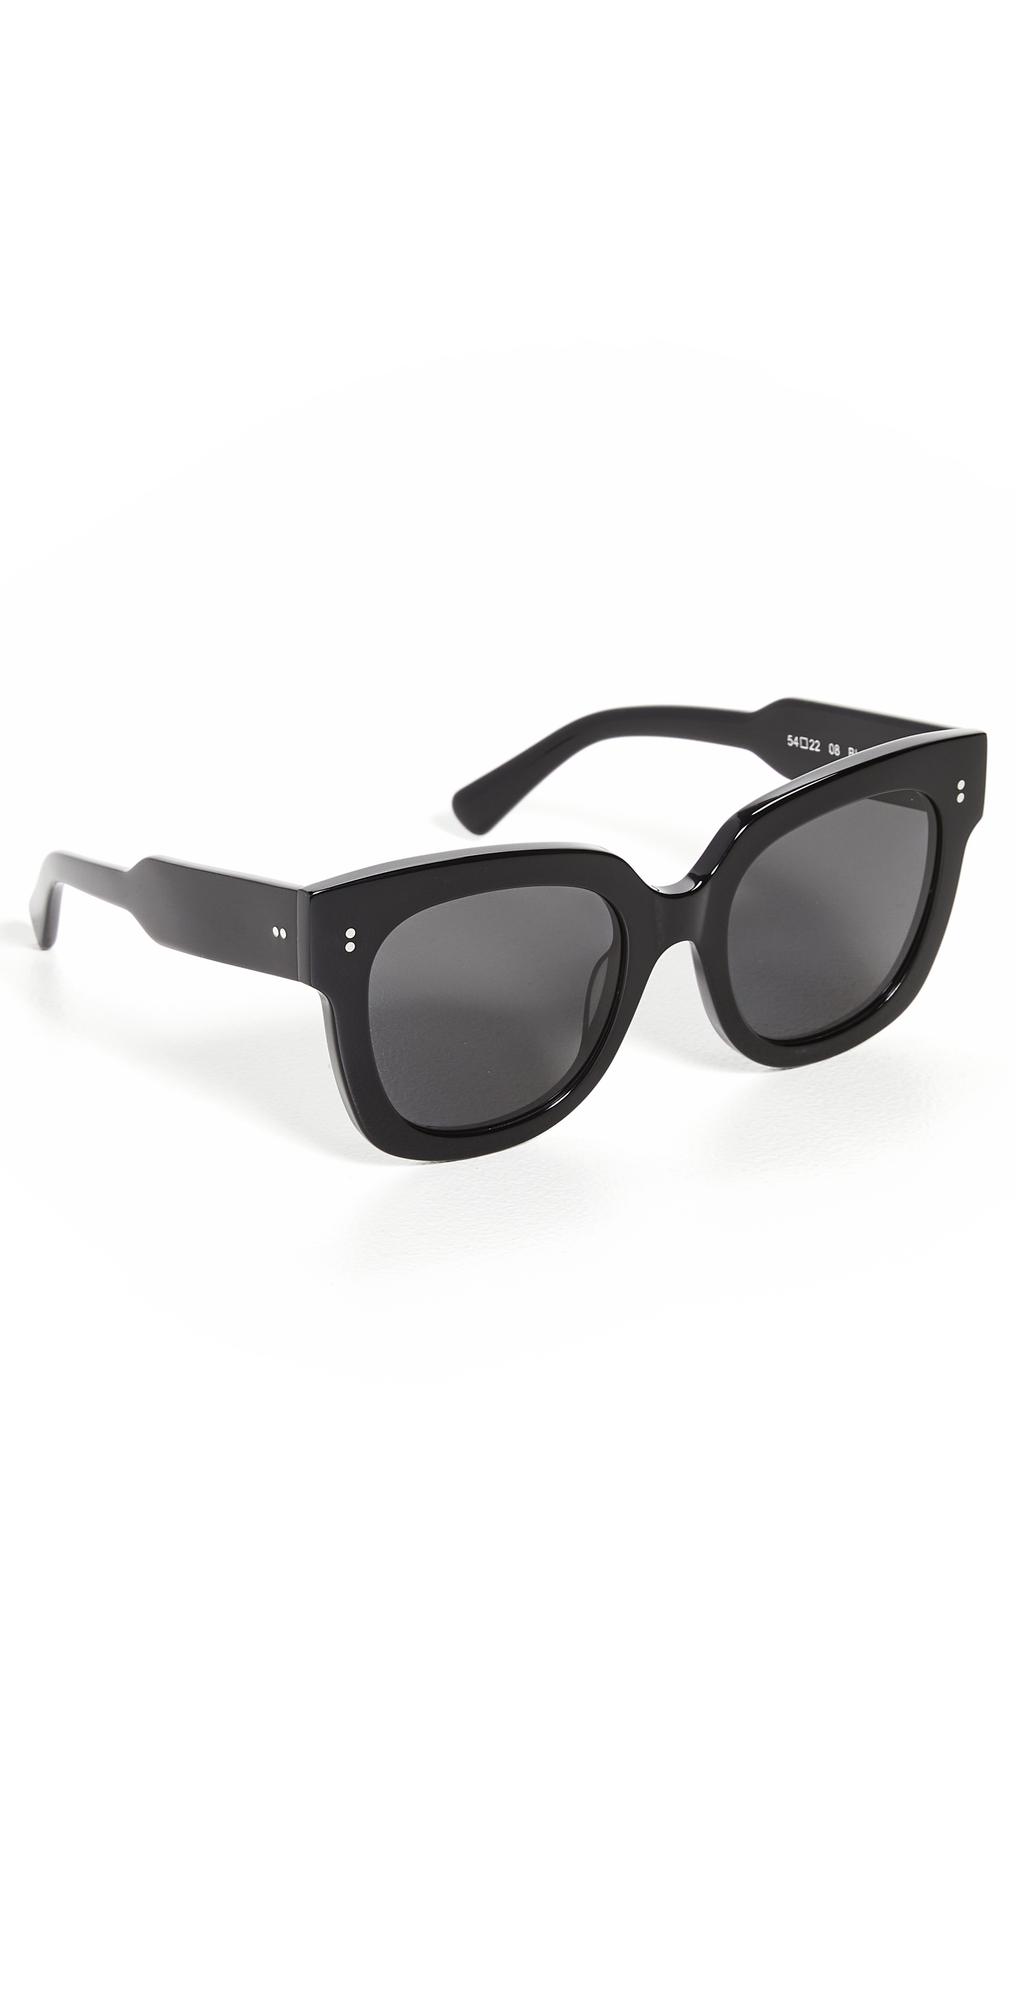 08 Sunglasses